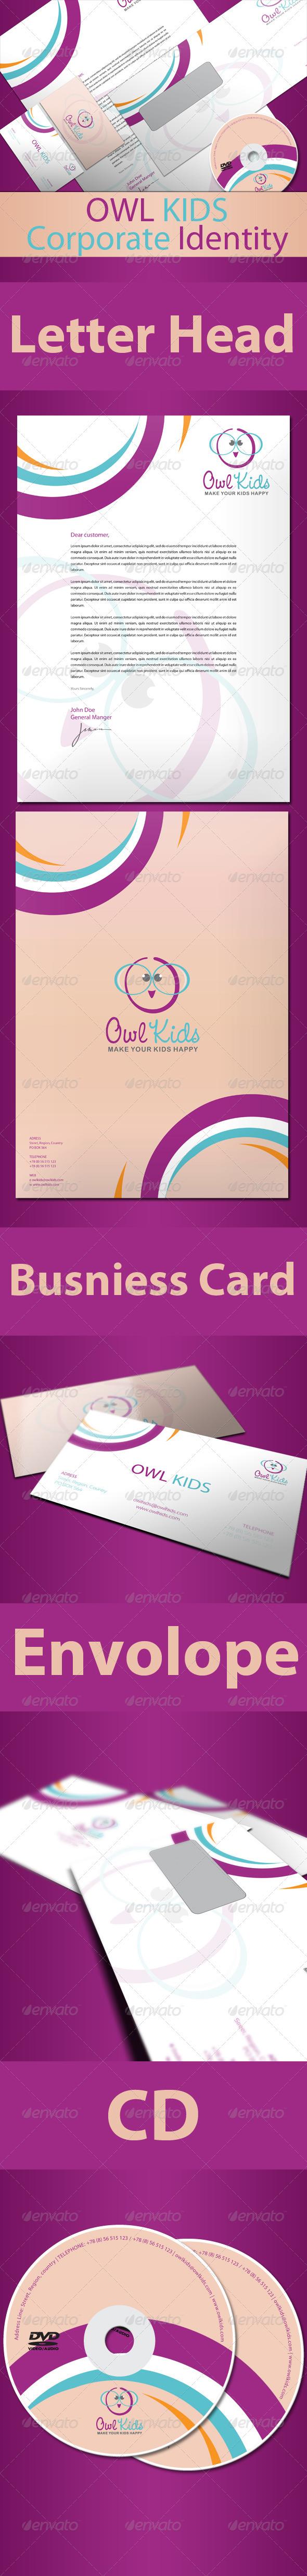 Owl Kids Corporate Identity - Stationery Print Templates